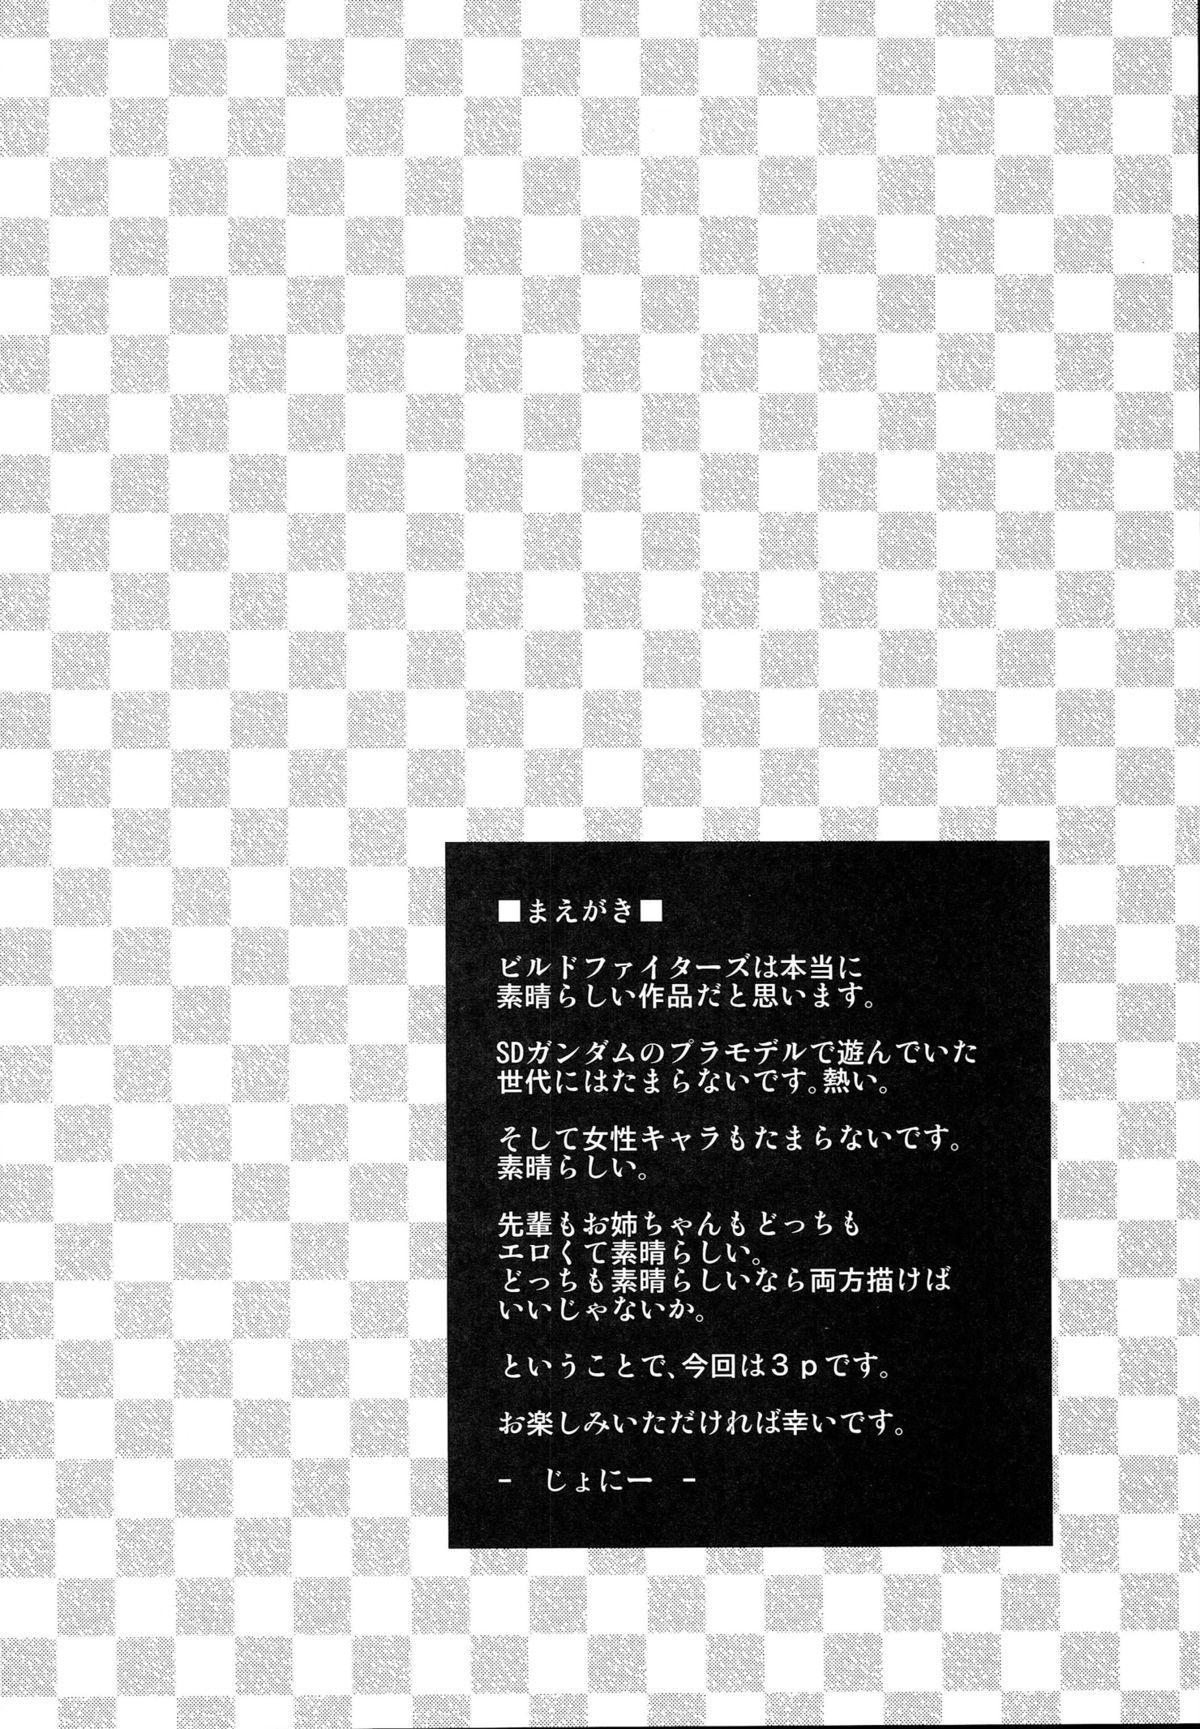 (C87) [from SCRATCH (Johnny) Amatoro Fighters Fumina senpai to Mirai oneechan no baai  (Gundam Build Fighters Try) 2